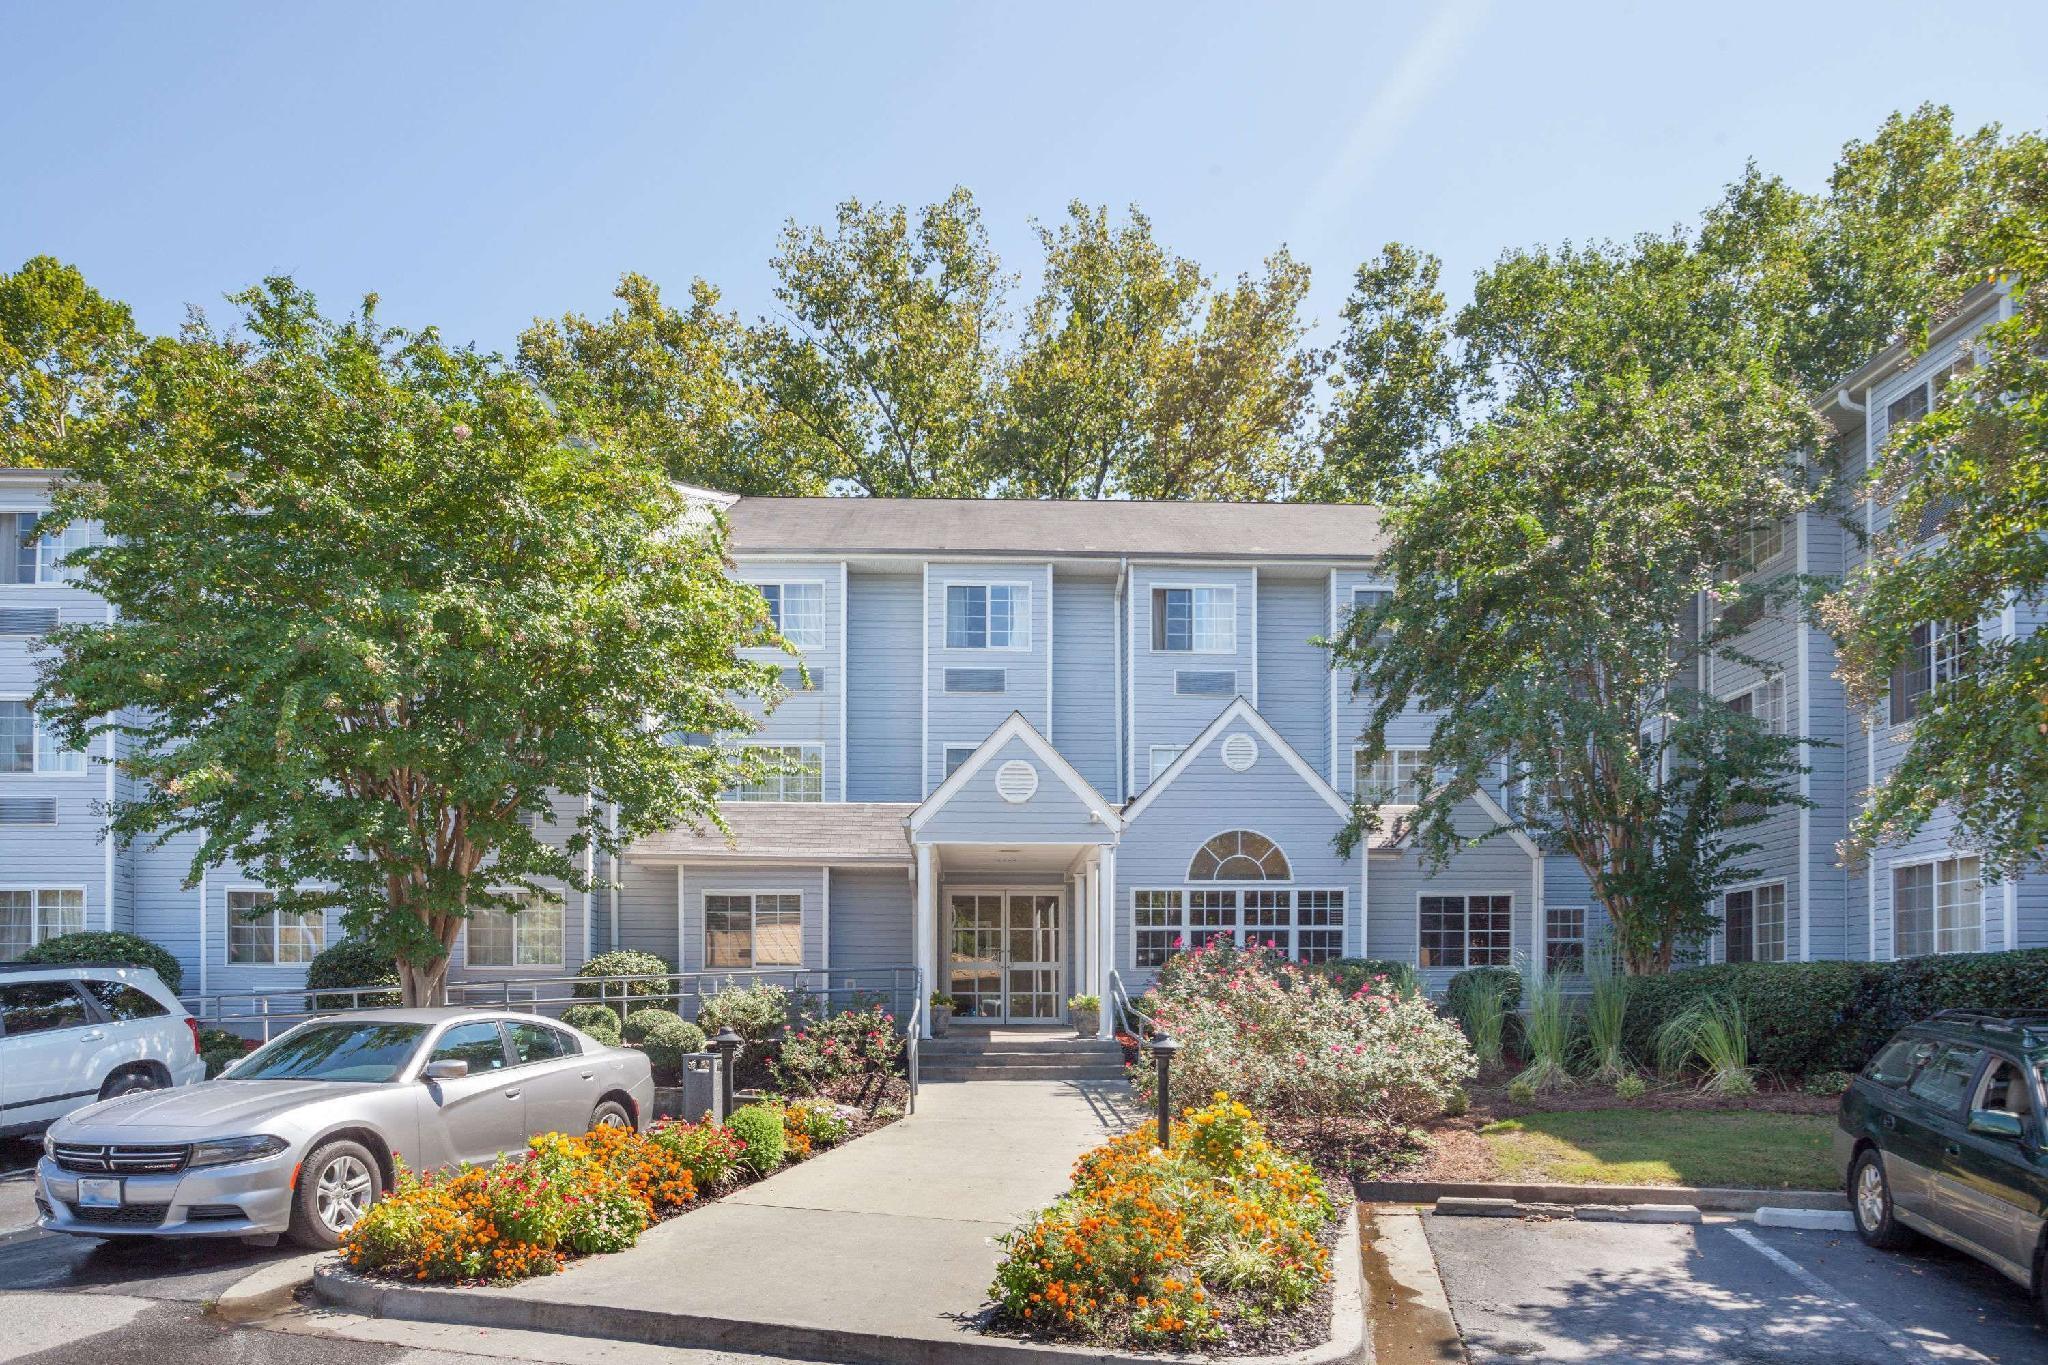 Microtel Inn And Suites By Wyndham Atlanta Buckhead Area